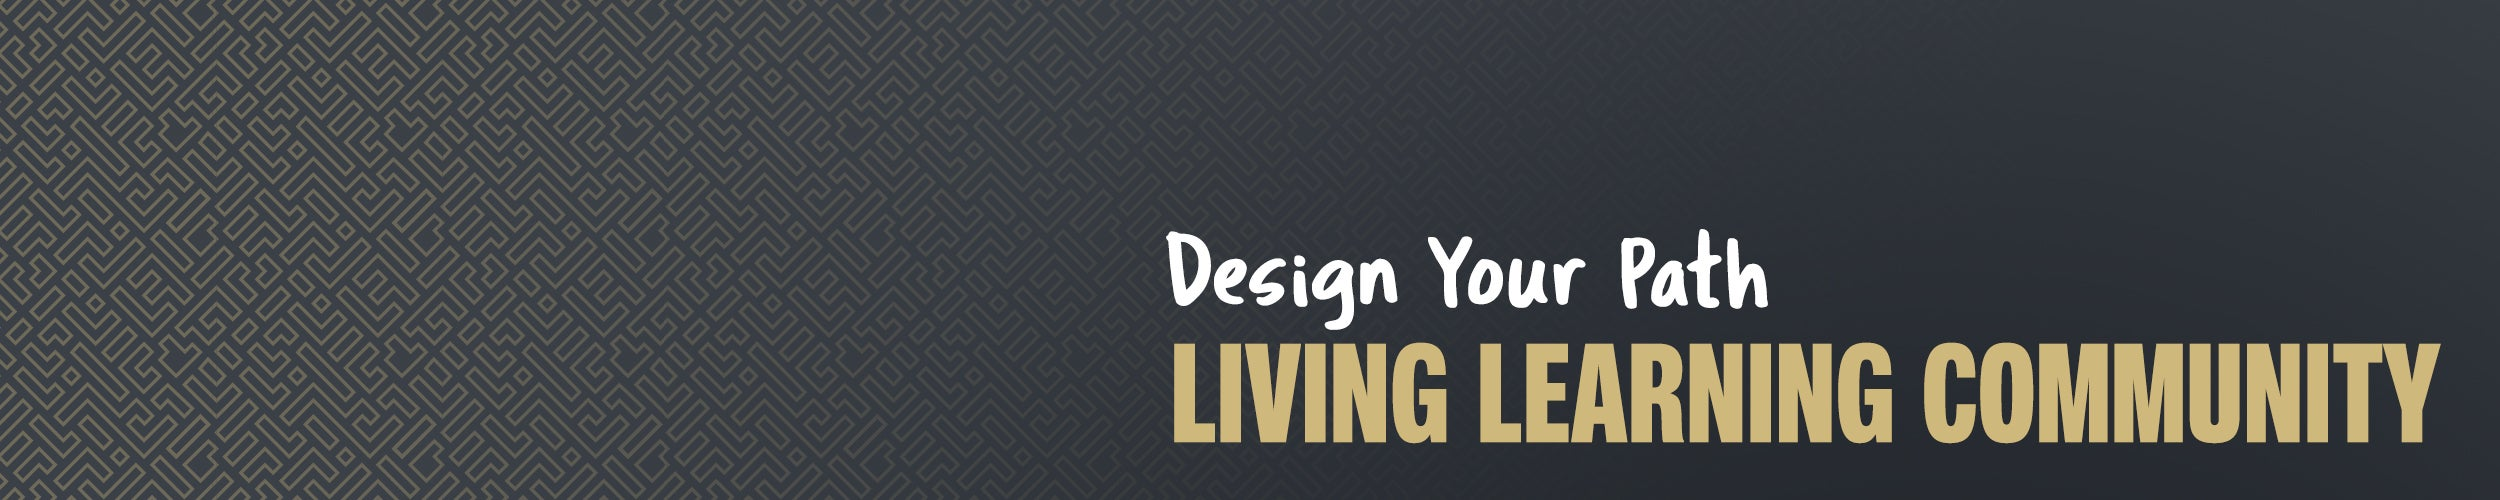 Design your path